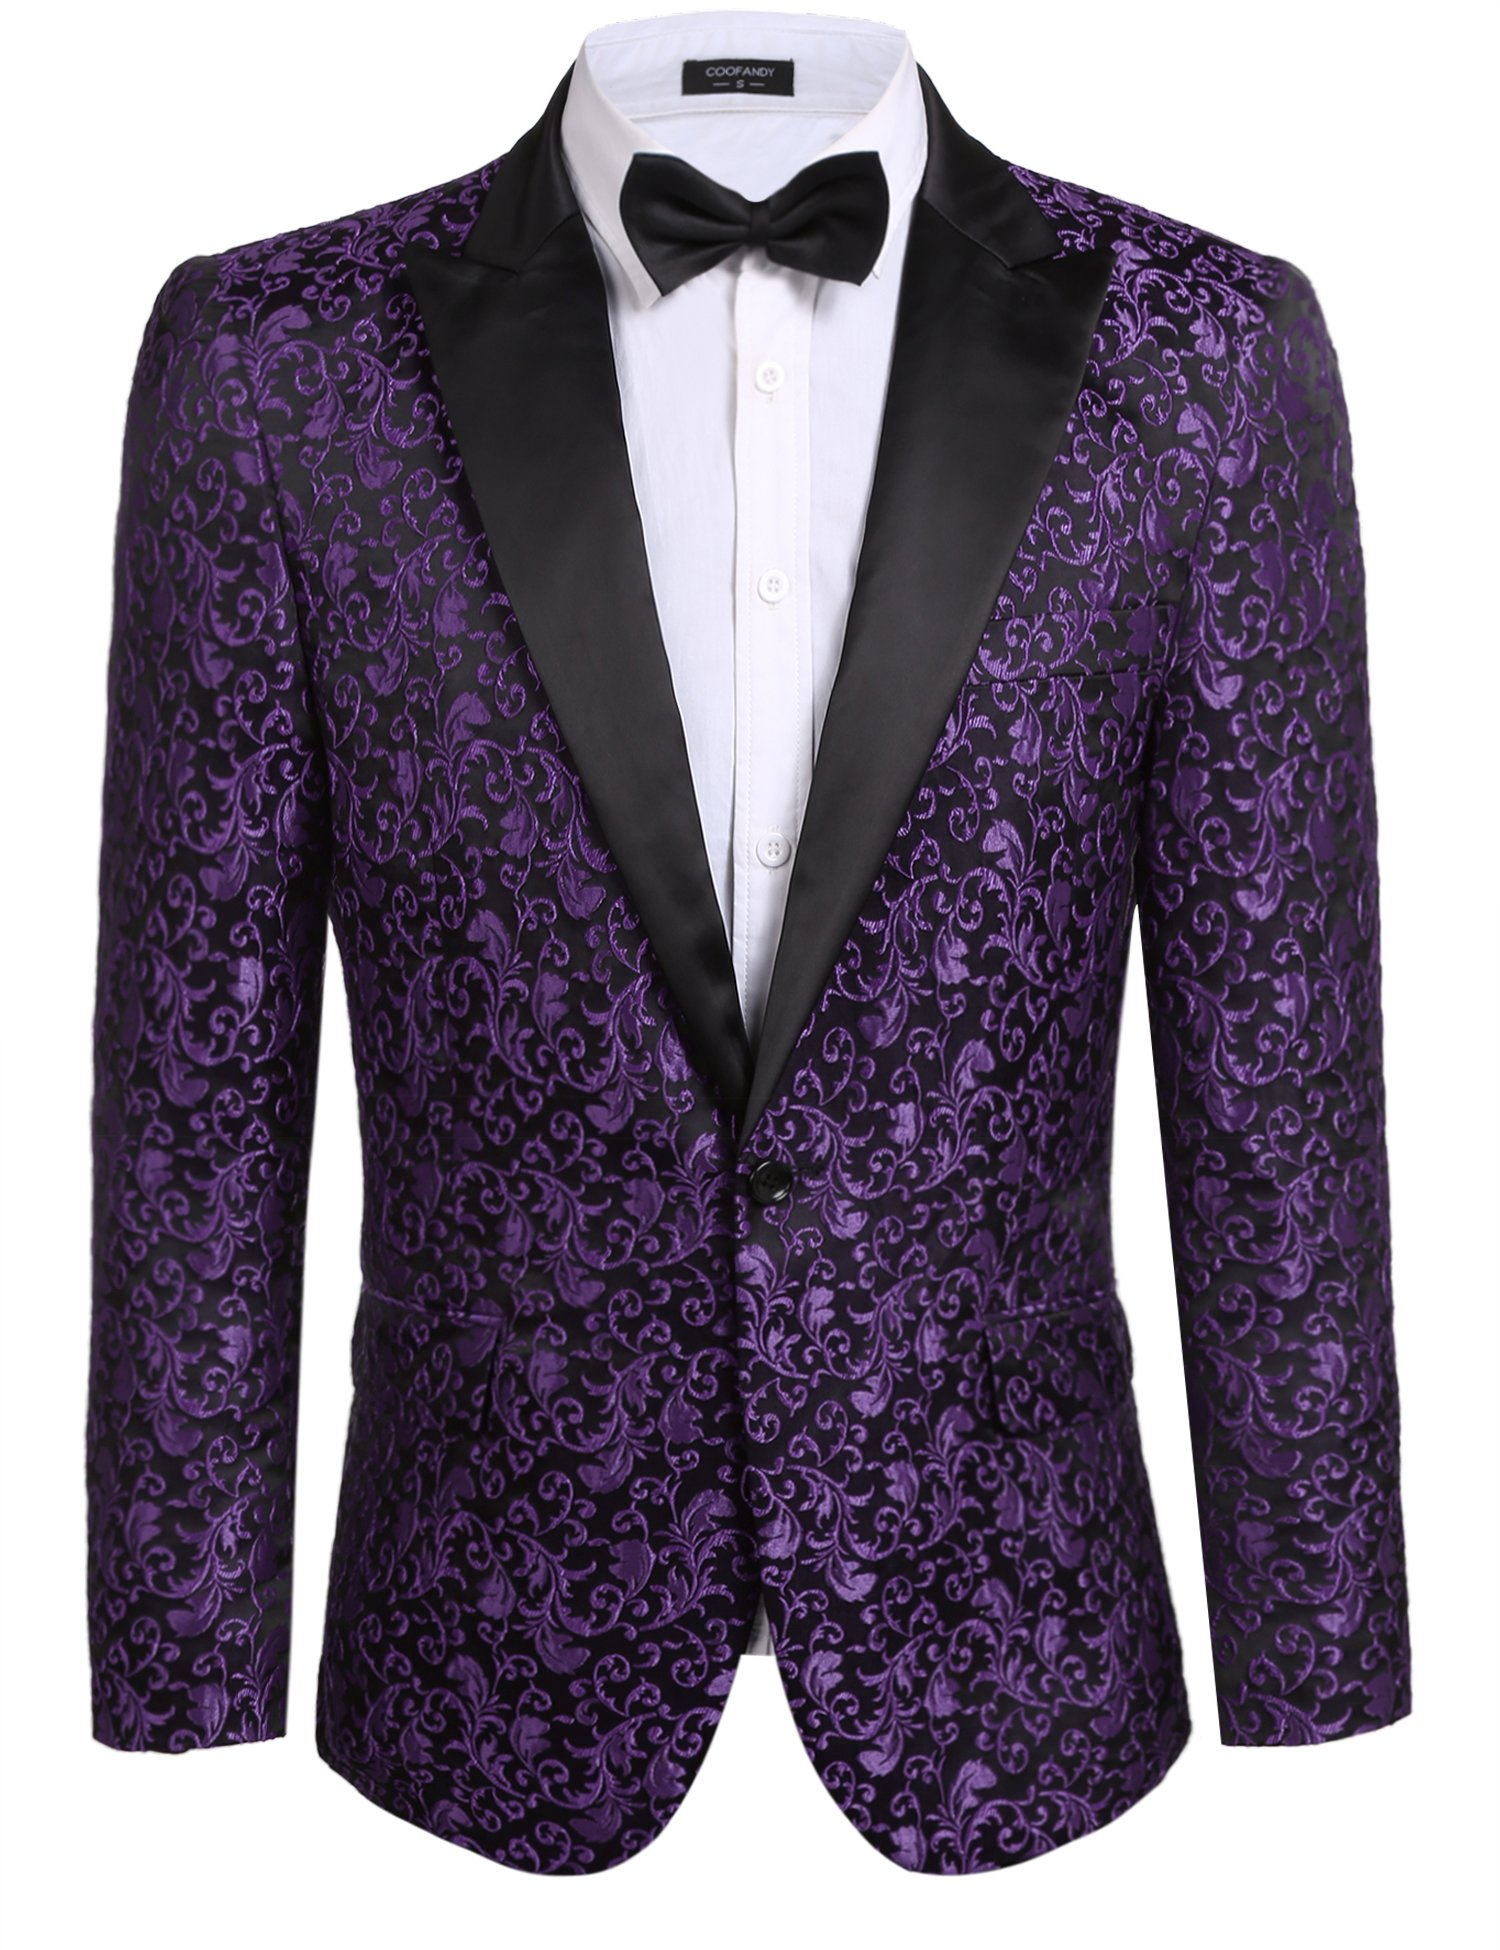 Coofandy Men's Floral Party Dress Suit Stylish Dinner Jacket Wedding Blazer One Button Tuxdeo Purple US XL